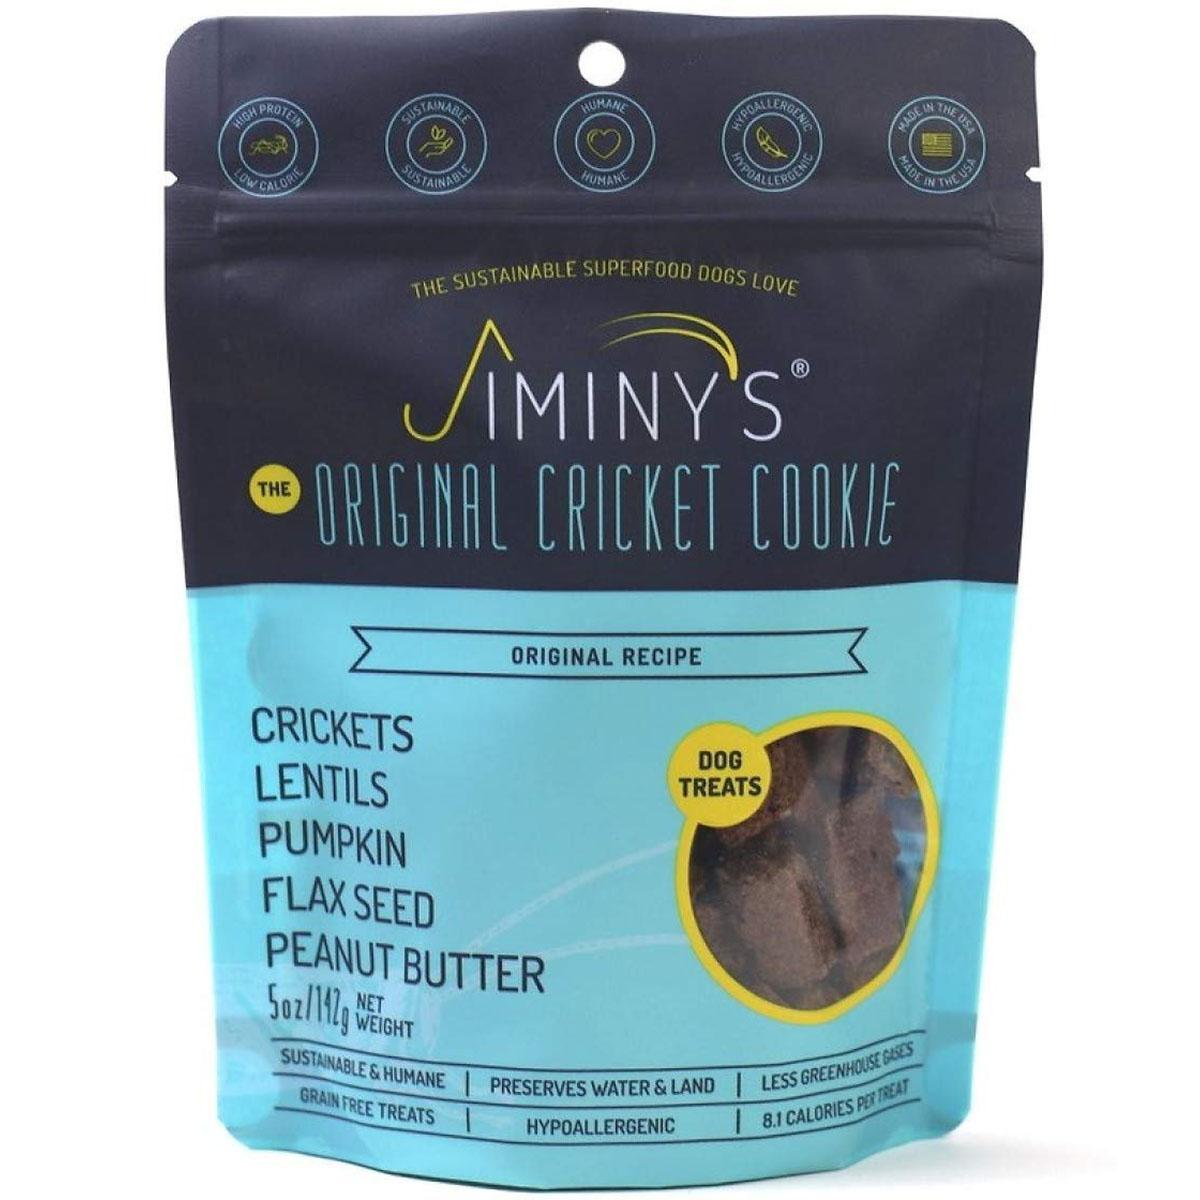 Jiminy's Cricket Cookie Original Recipe Dog Treats